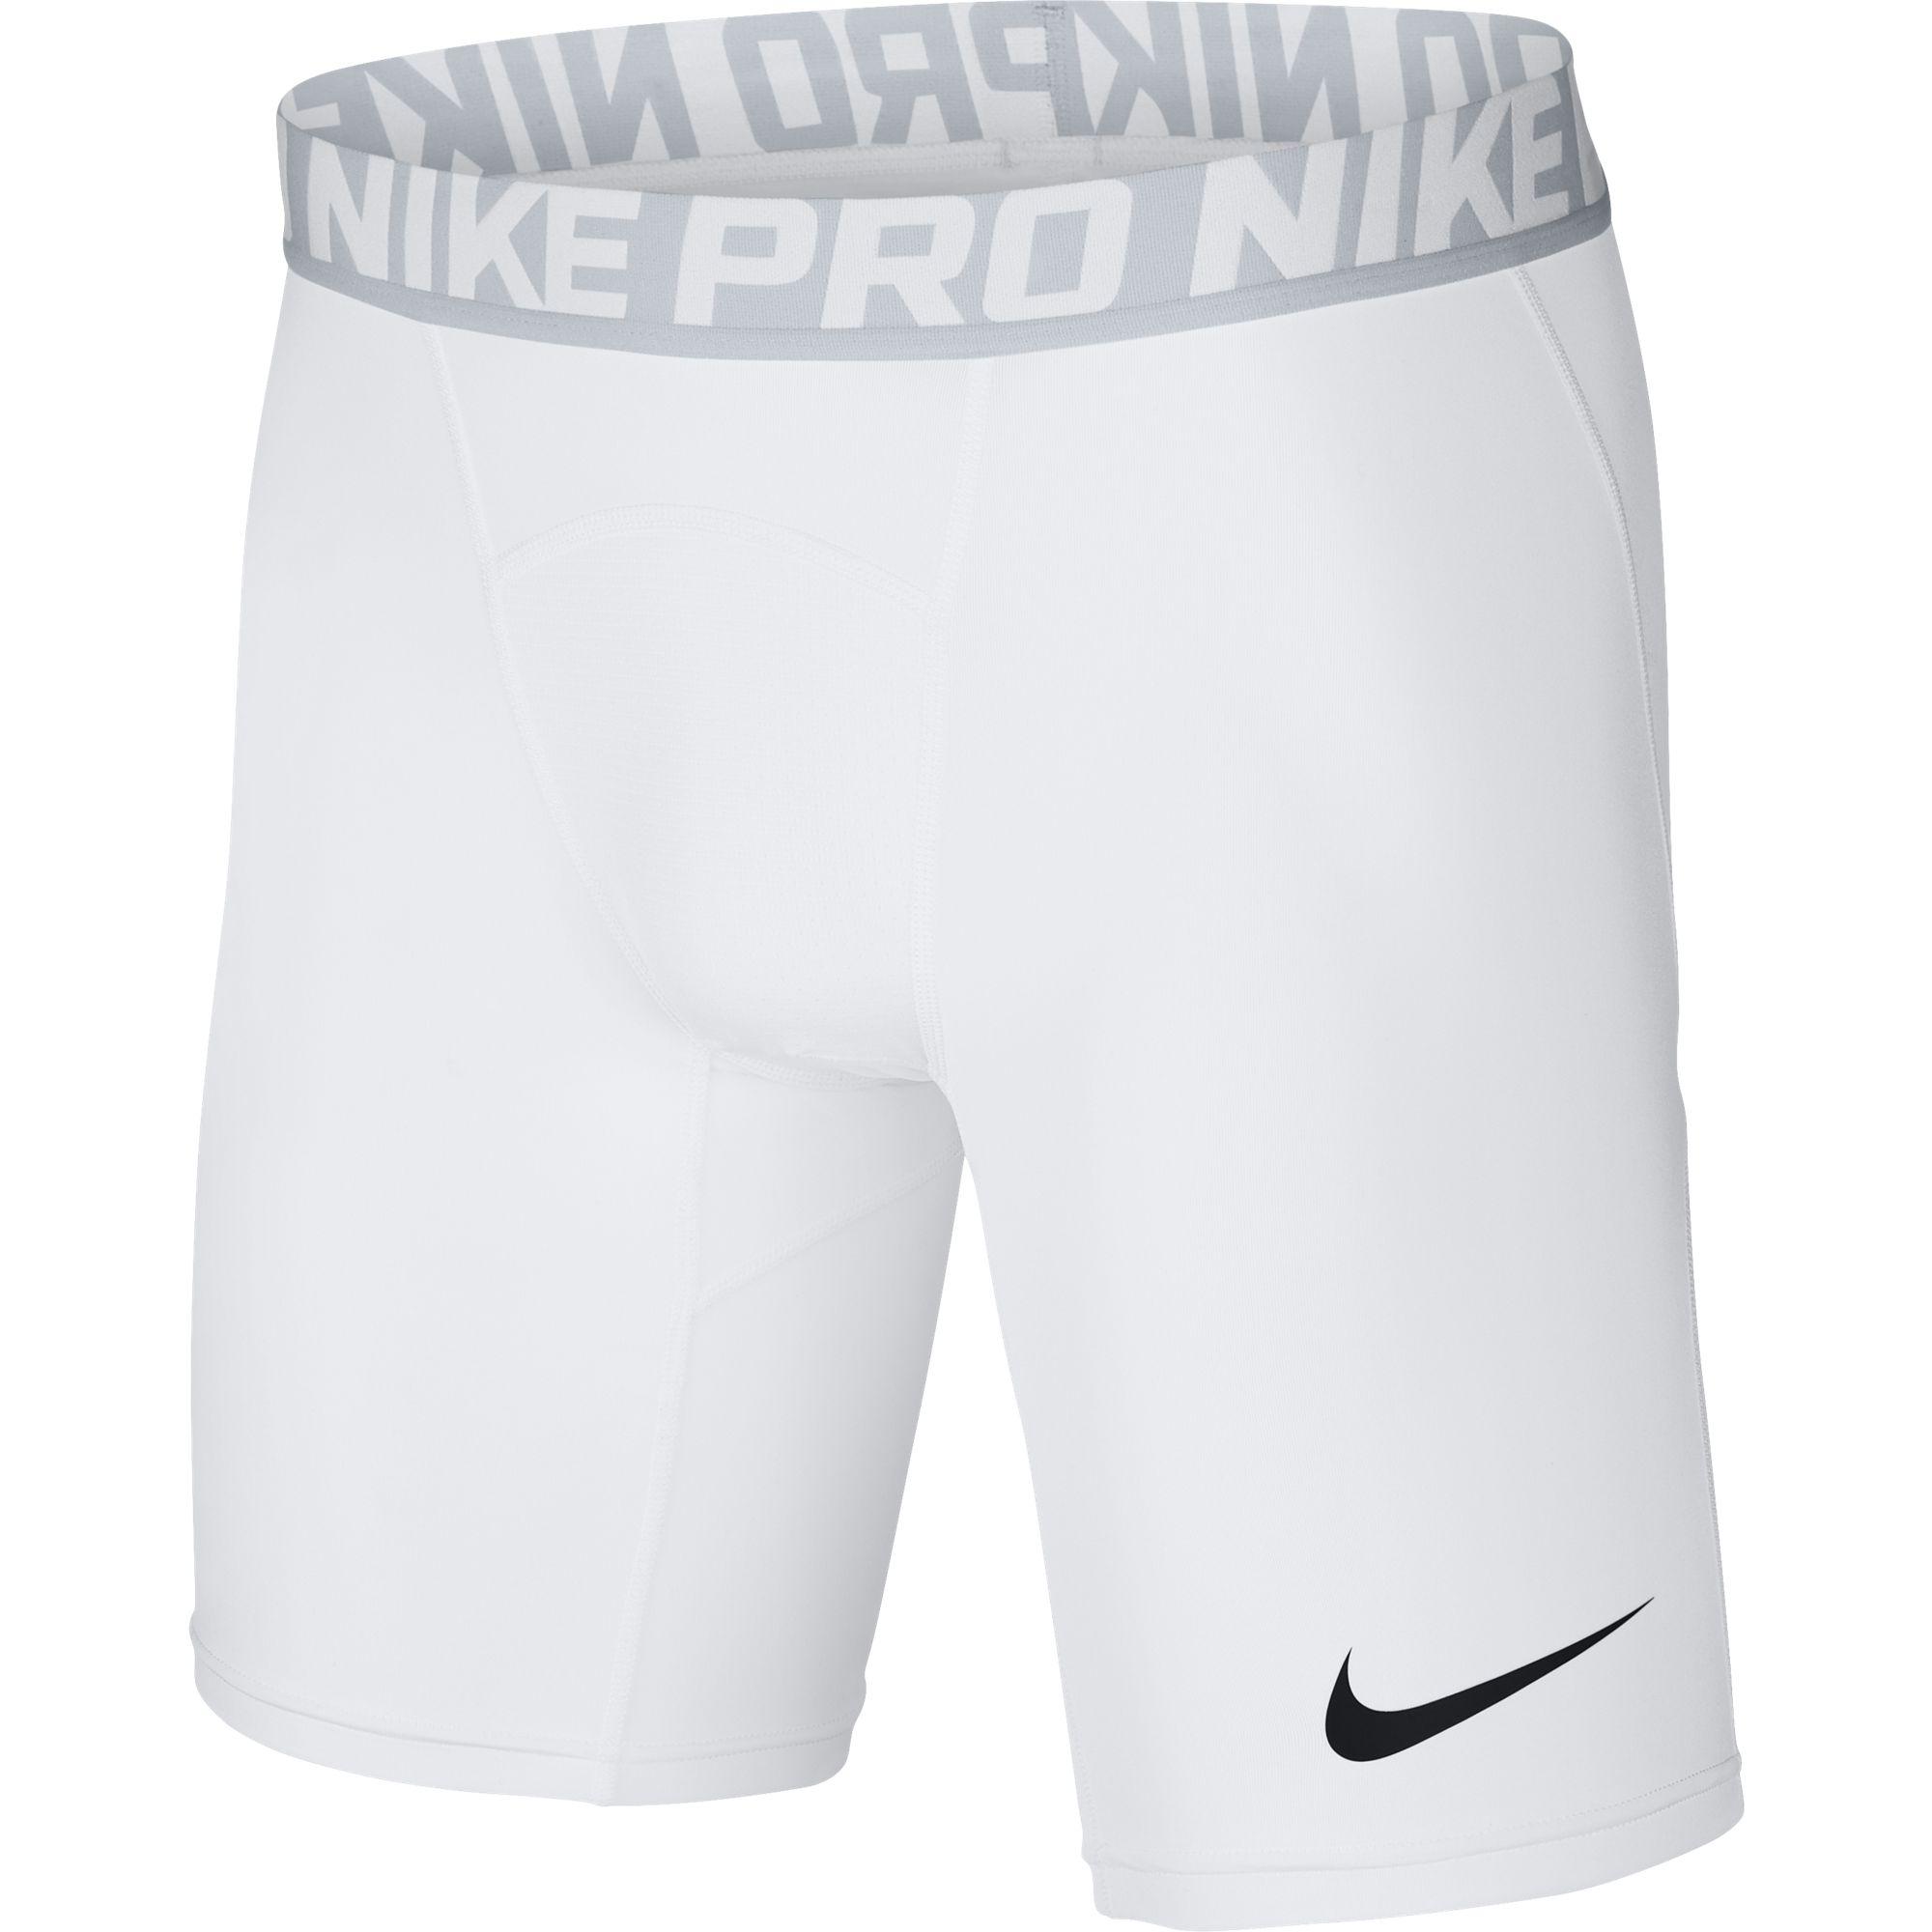 Men's Pro Short, White, swatch